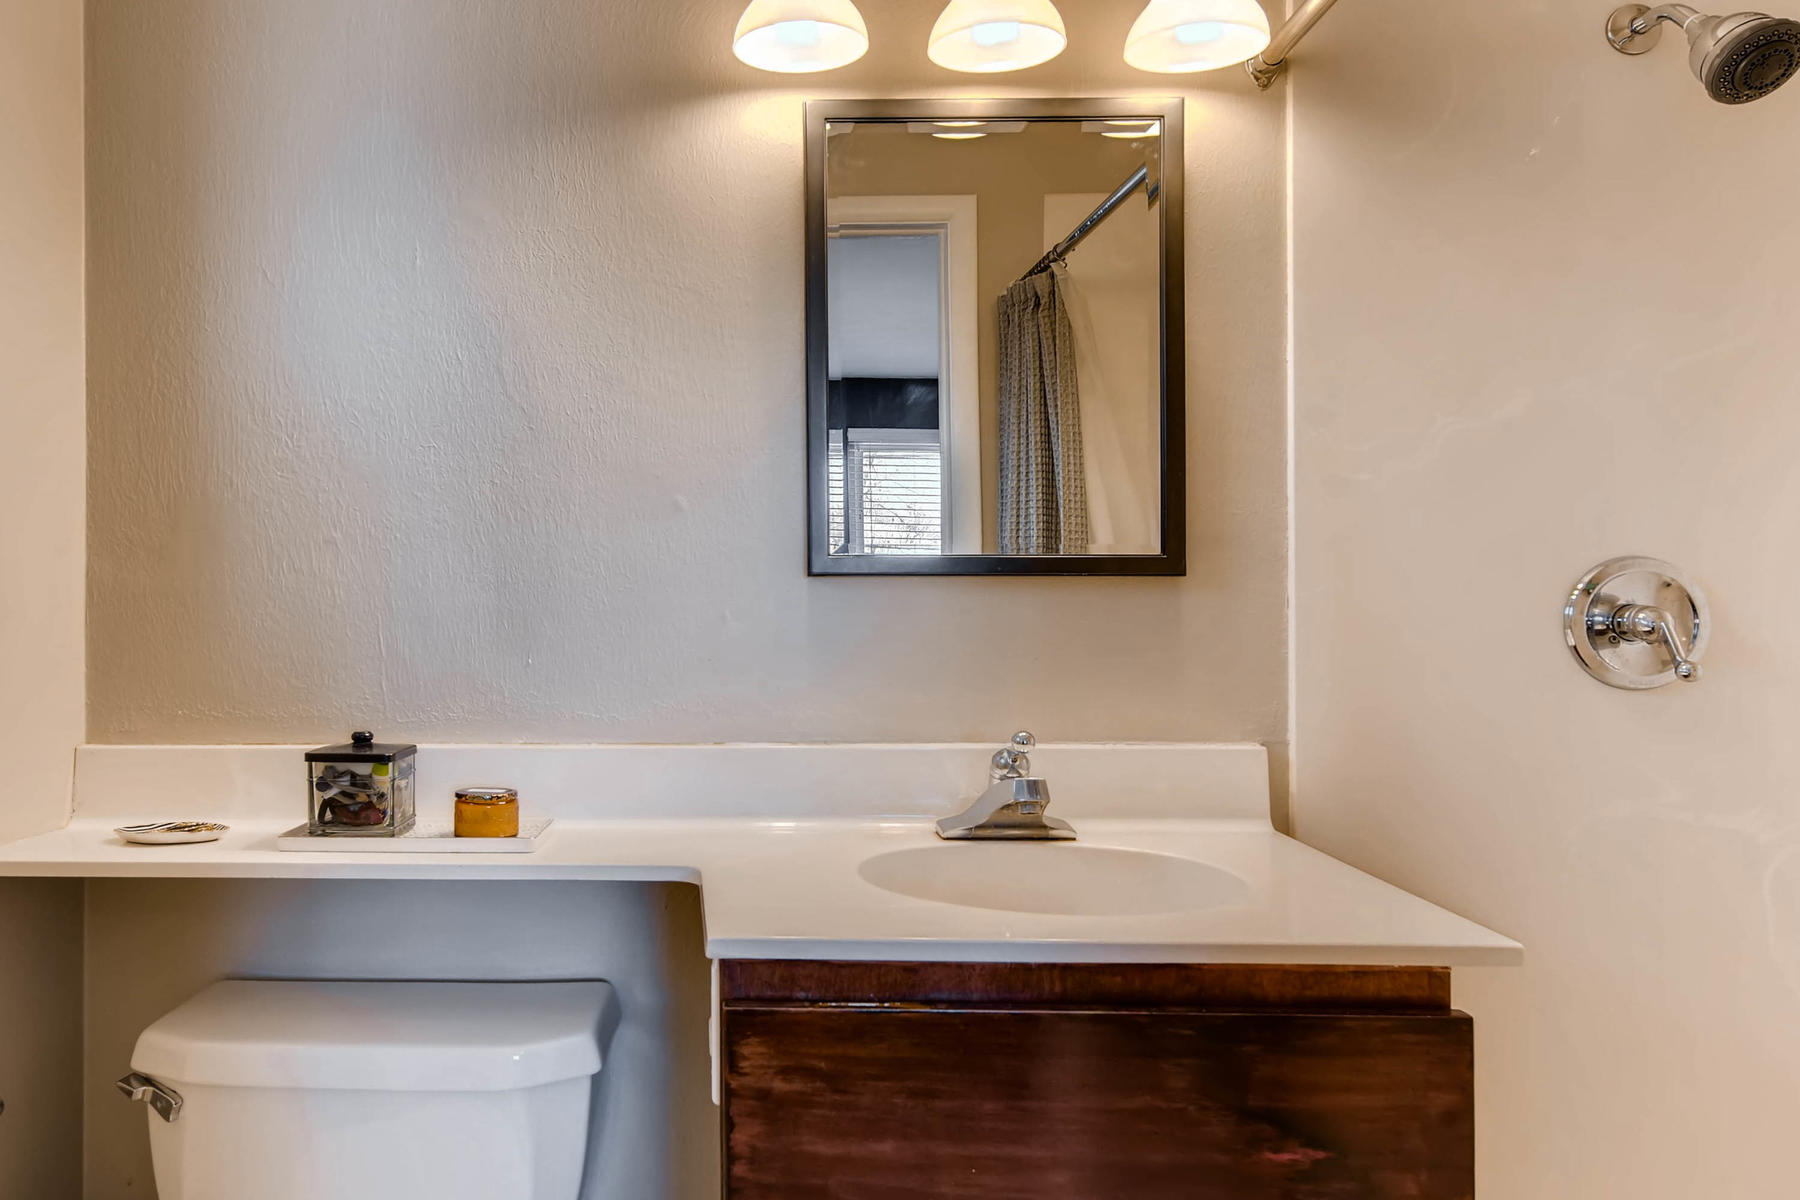 6676 S Kit Carson St-MLS_Size-015-9-Master Bathroom-1800x1200-72dpi.jpg